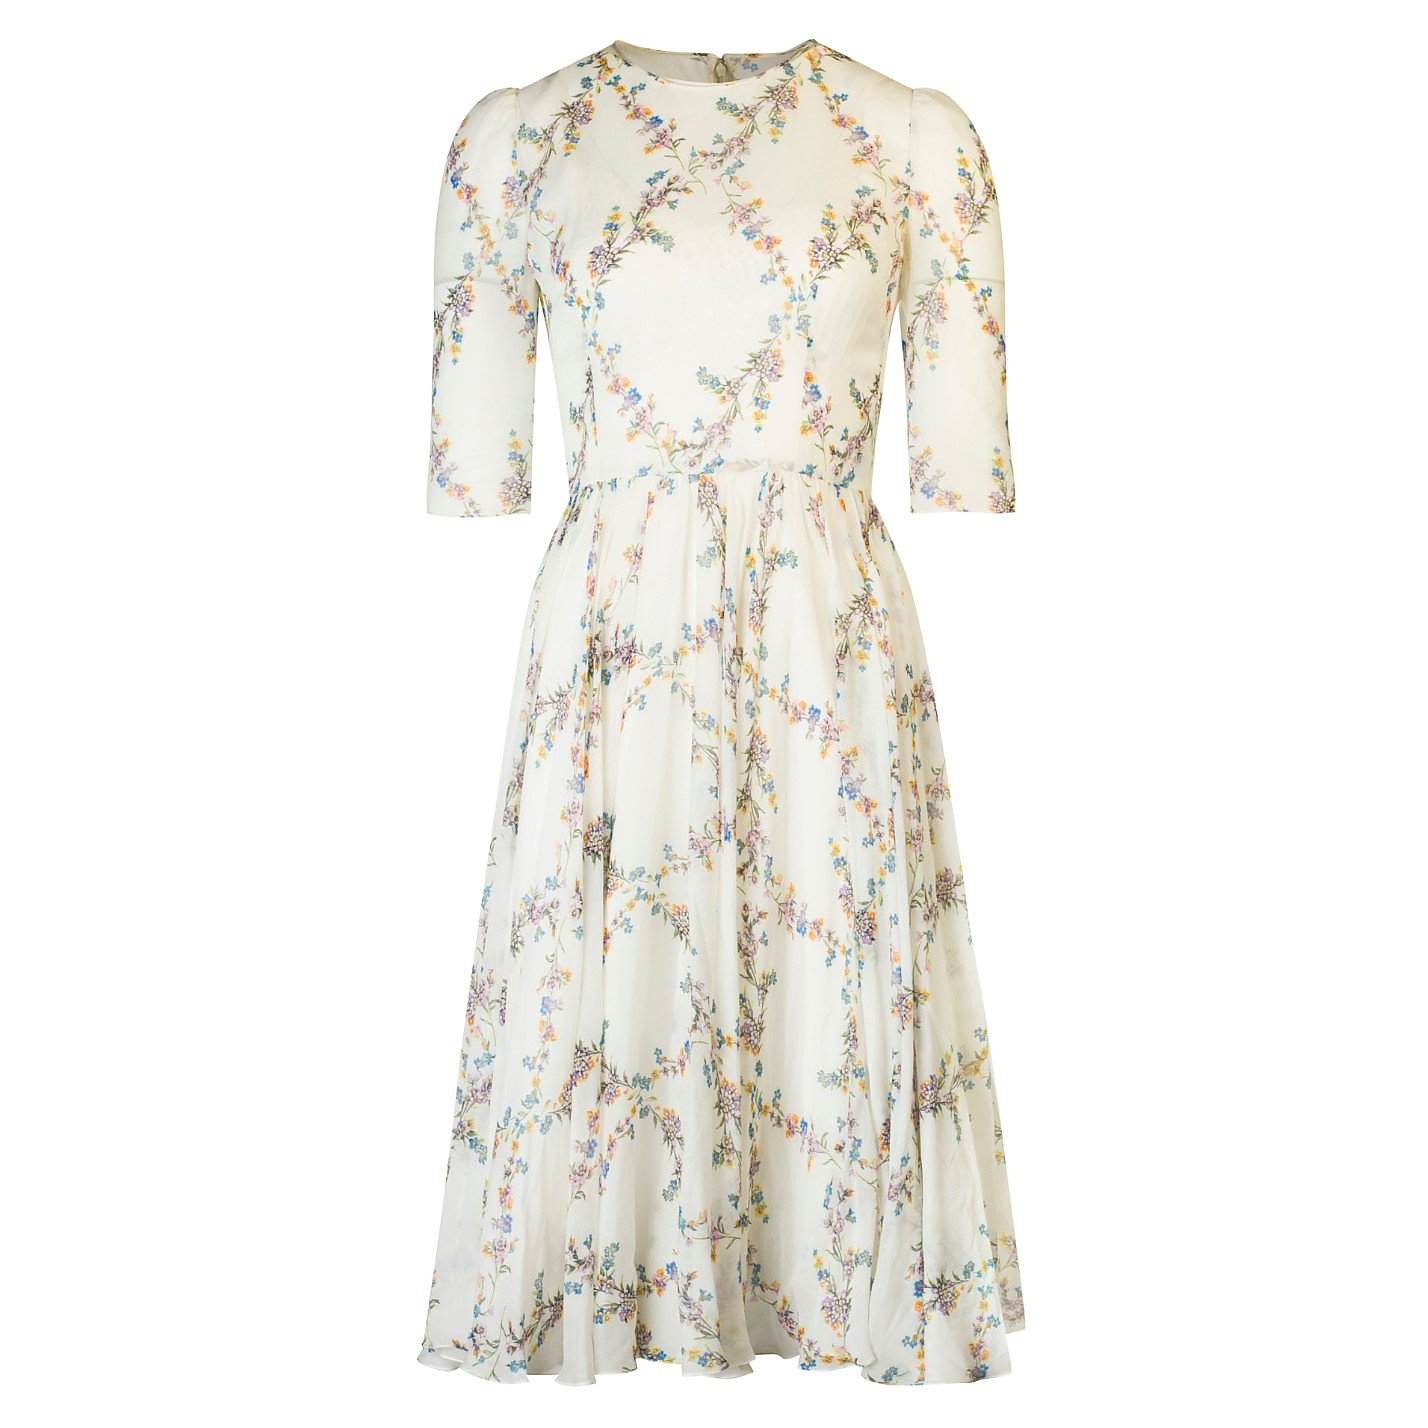 DOLCE & GABBANA Floral Print Silk Midi Dress